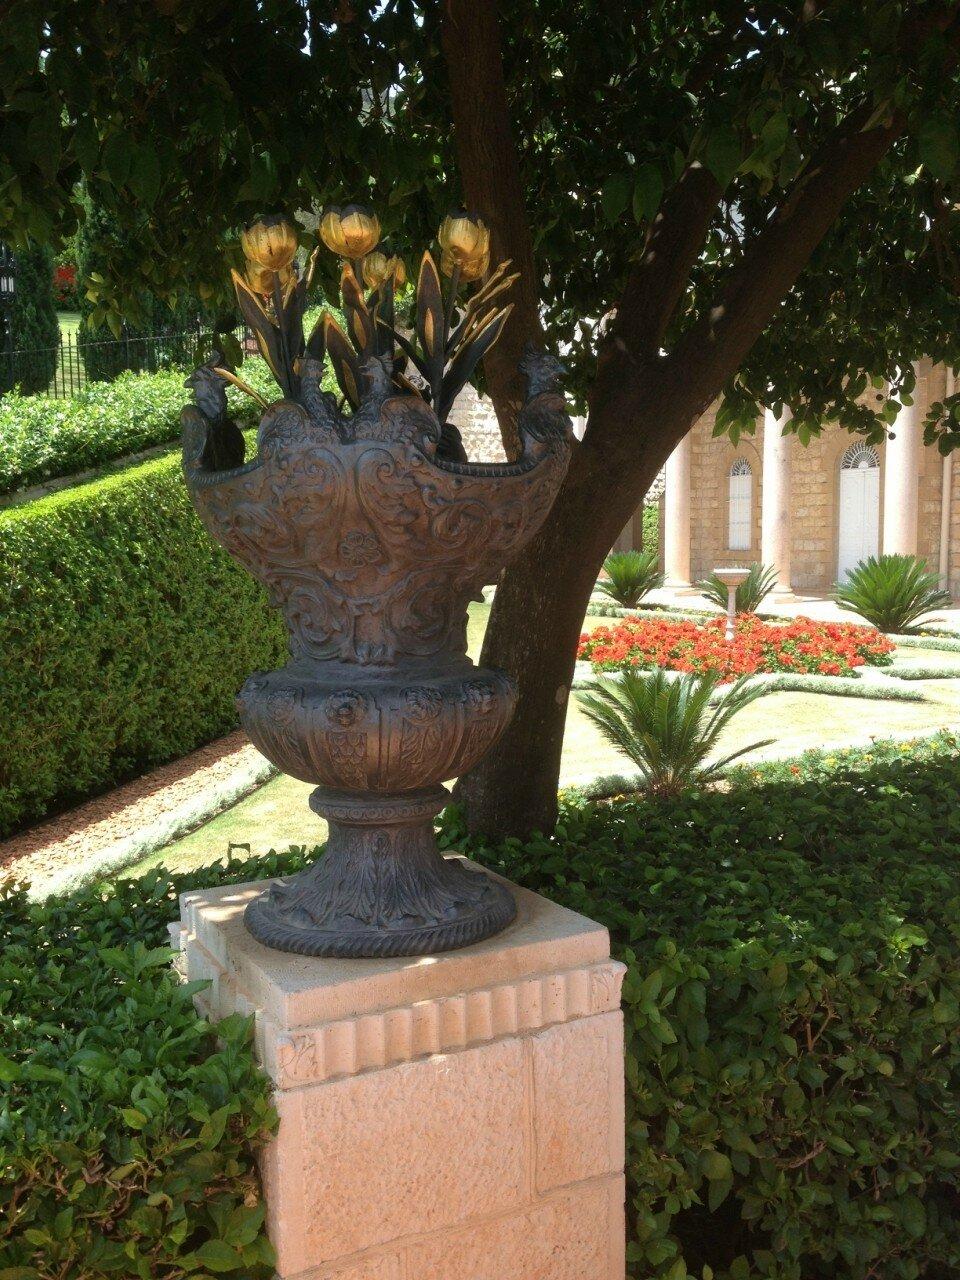 Цветы в вазе — символ красоты